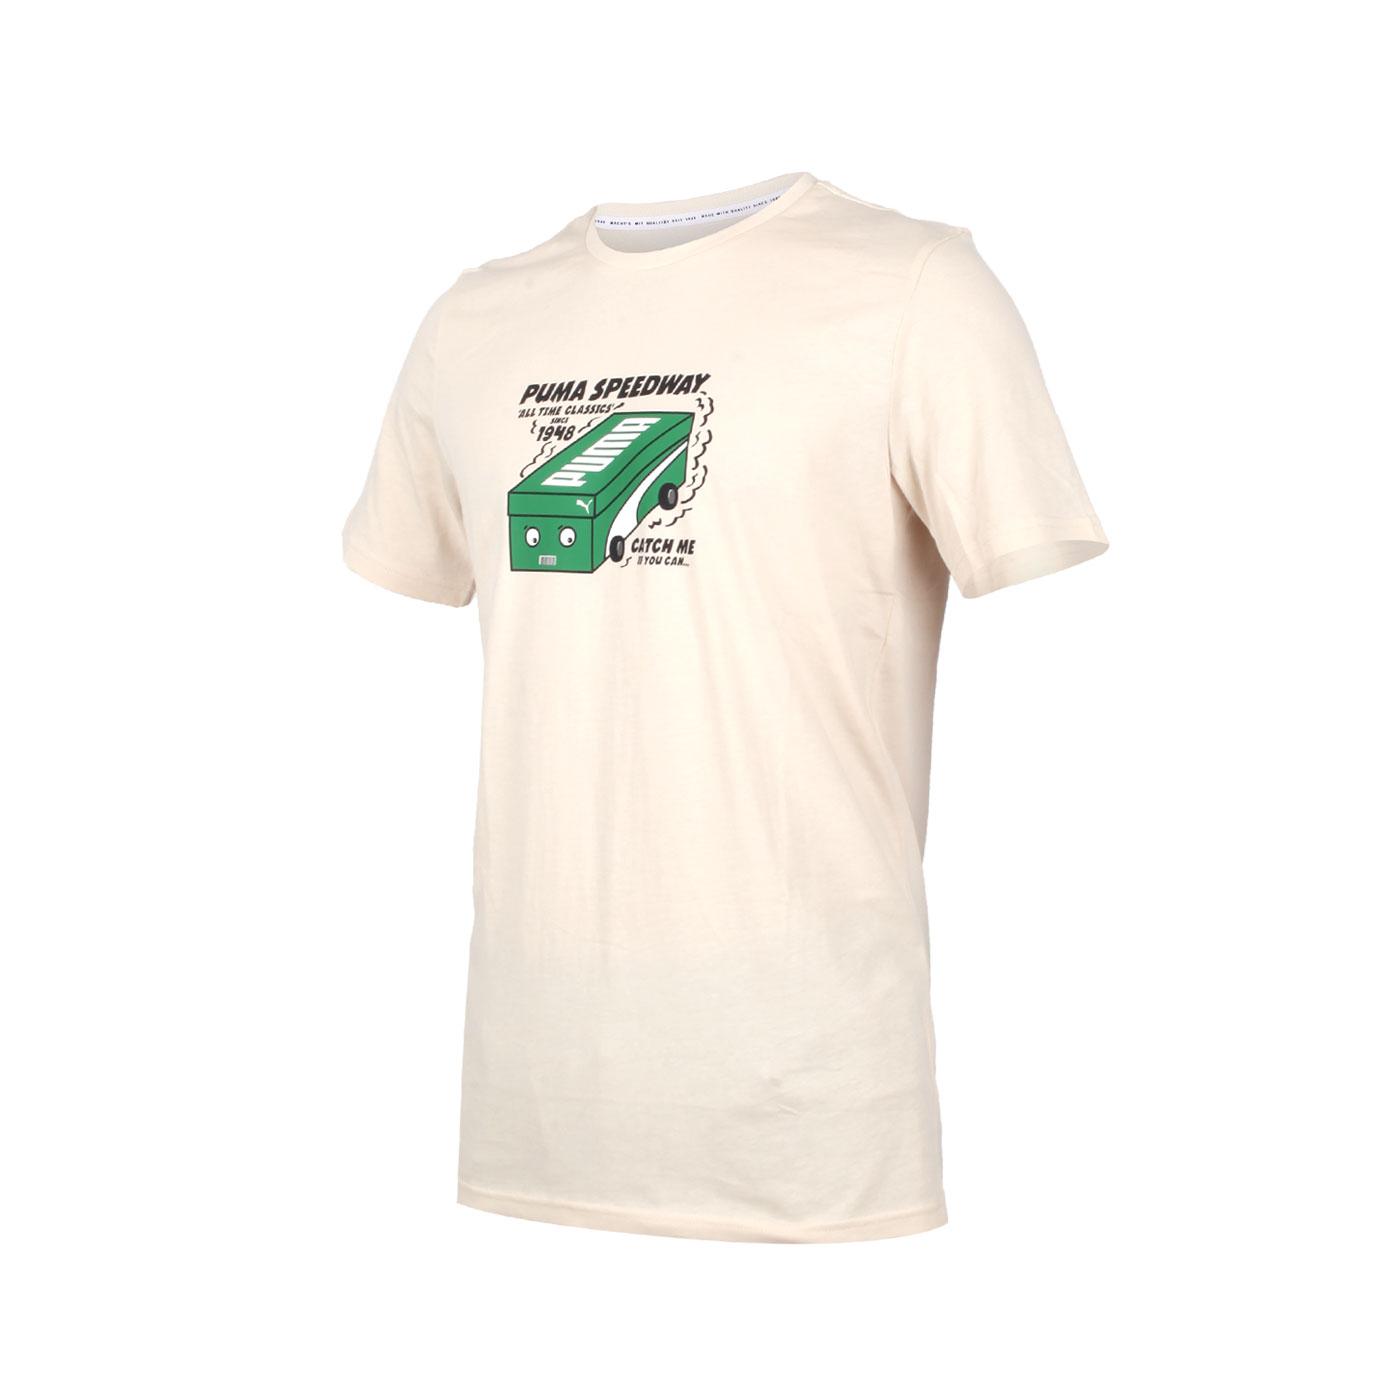 PUMA 男款流行系列短袖T恤 59862752 - 淺卡其綠黑